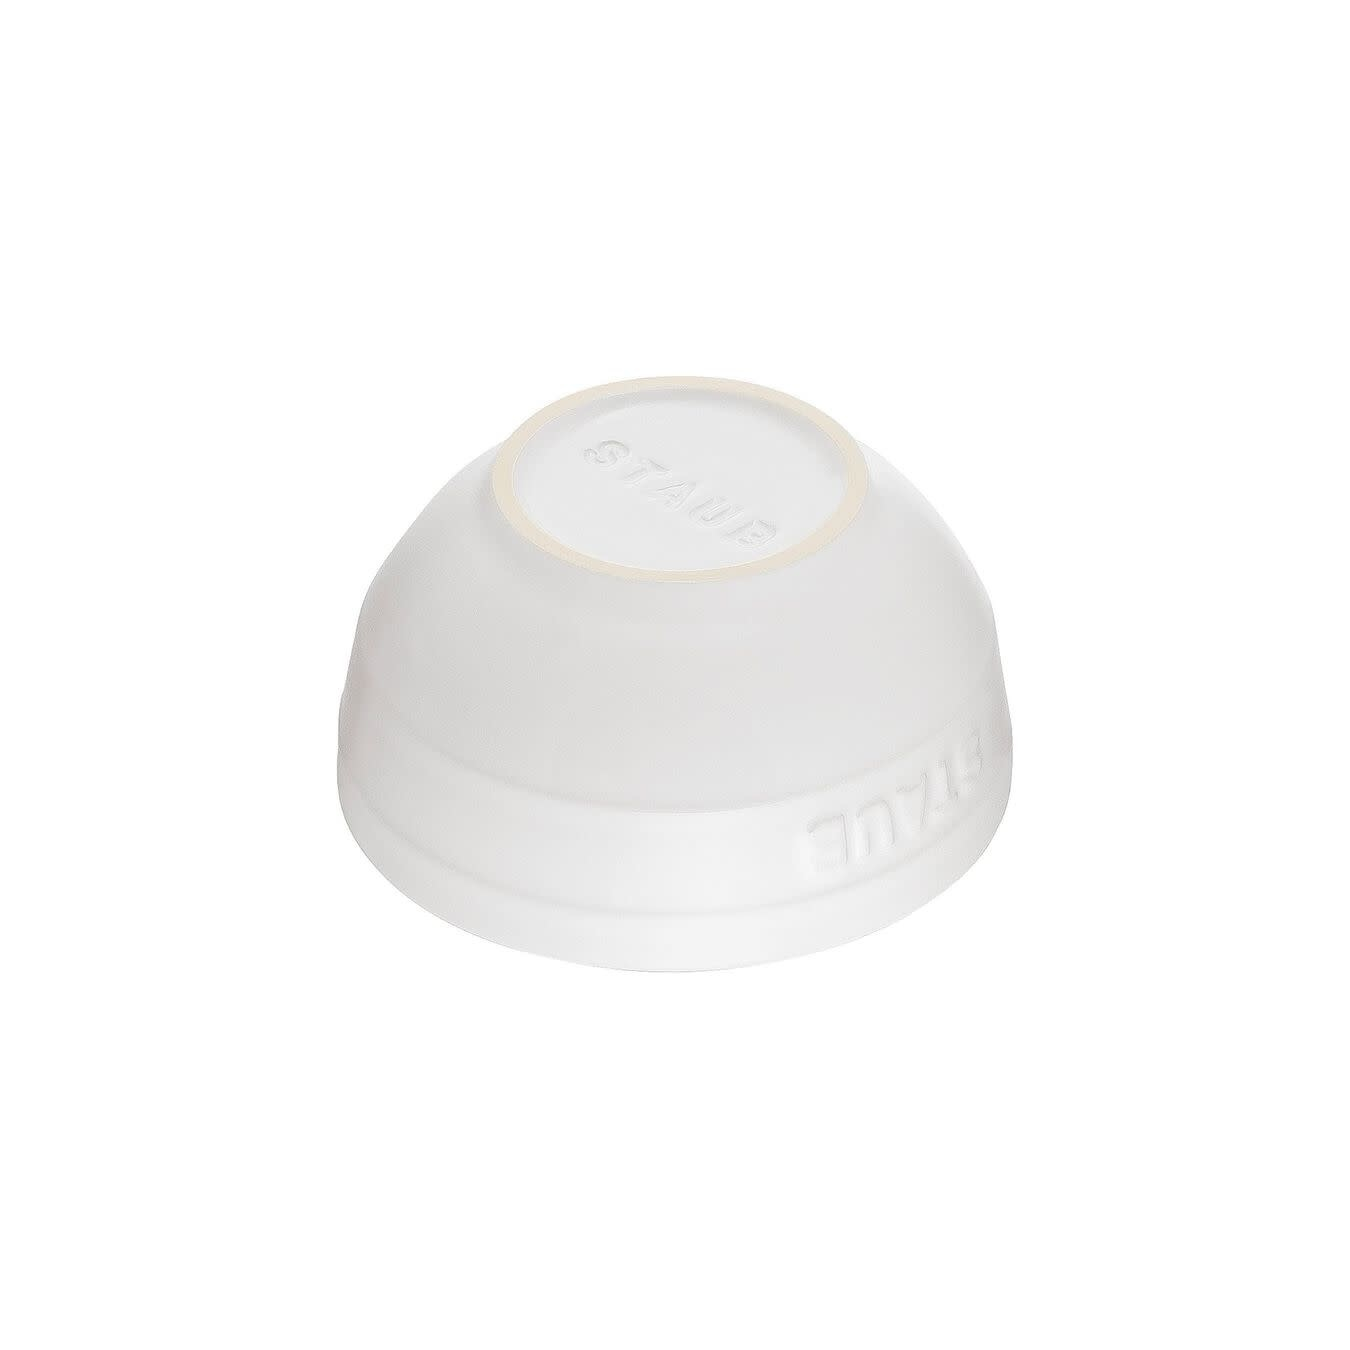 "Staub Bowl Small White 12cm / 4.75"""